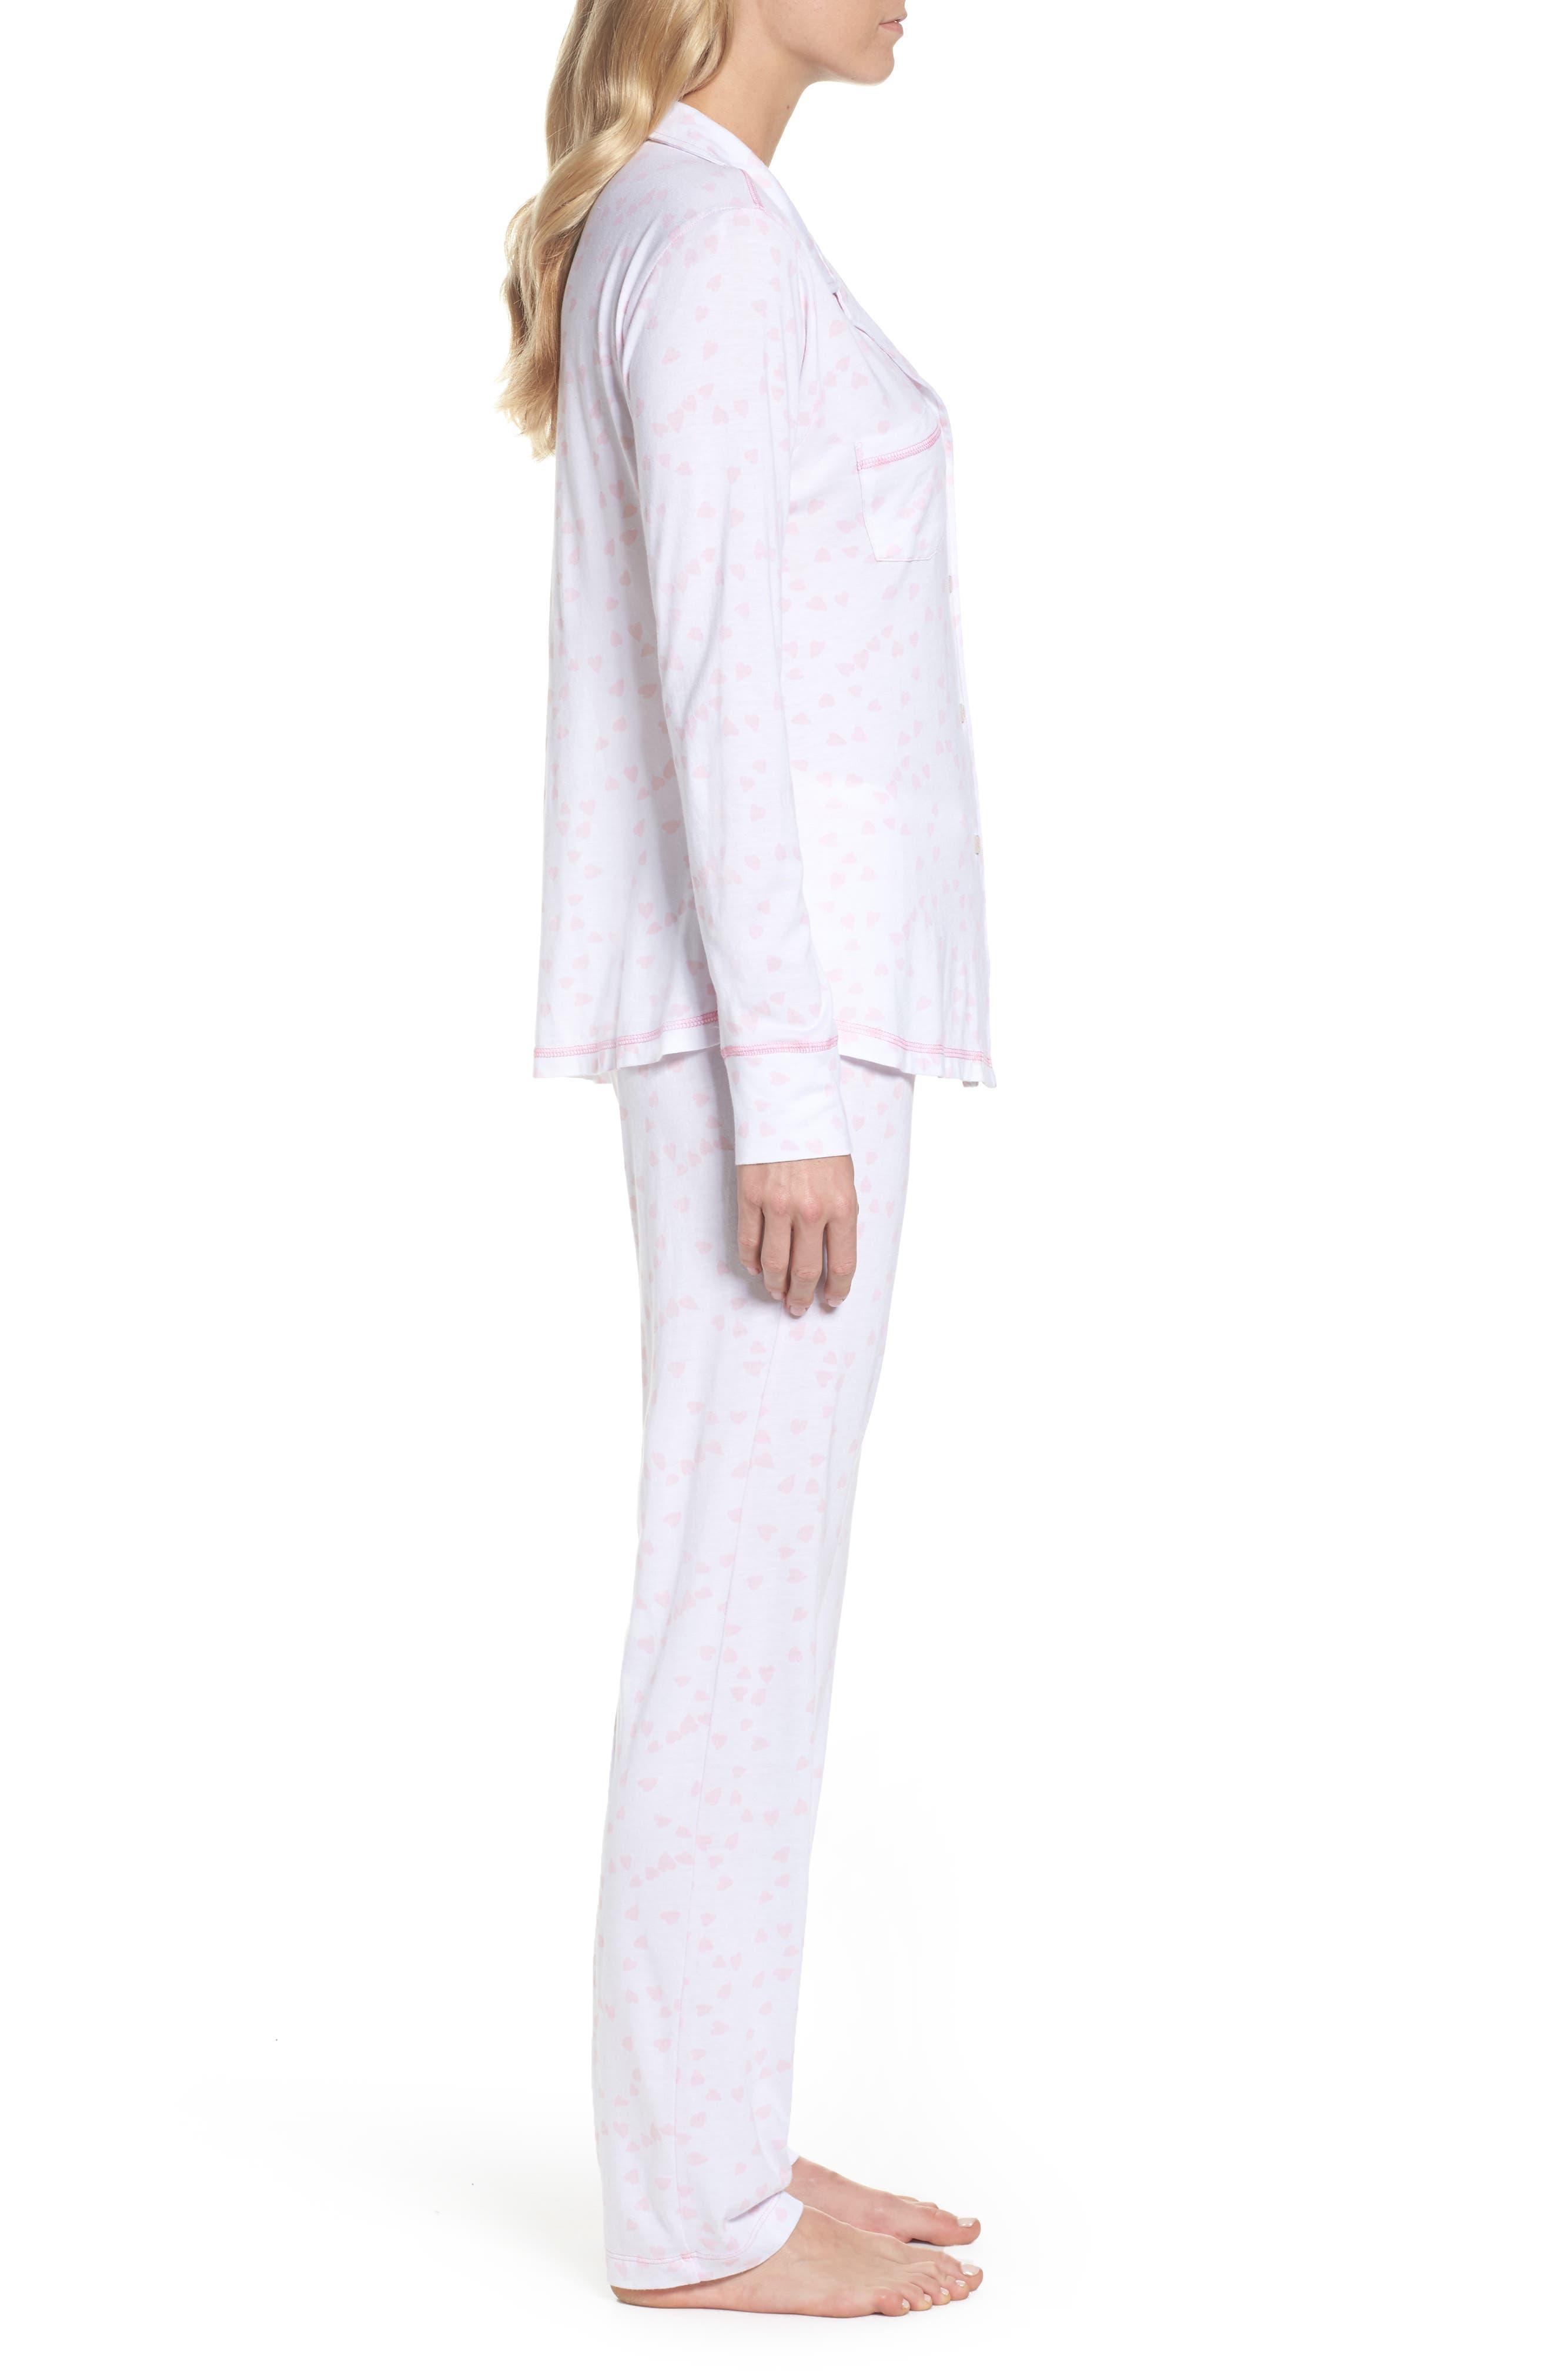 Cassie Pajamas,                             Alternate thumbnail 3, color,                             650